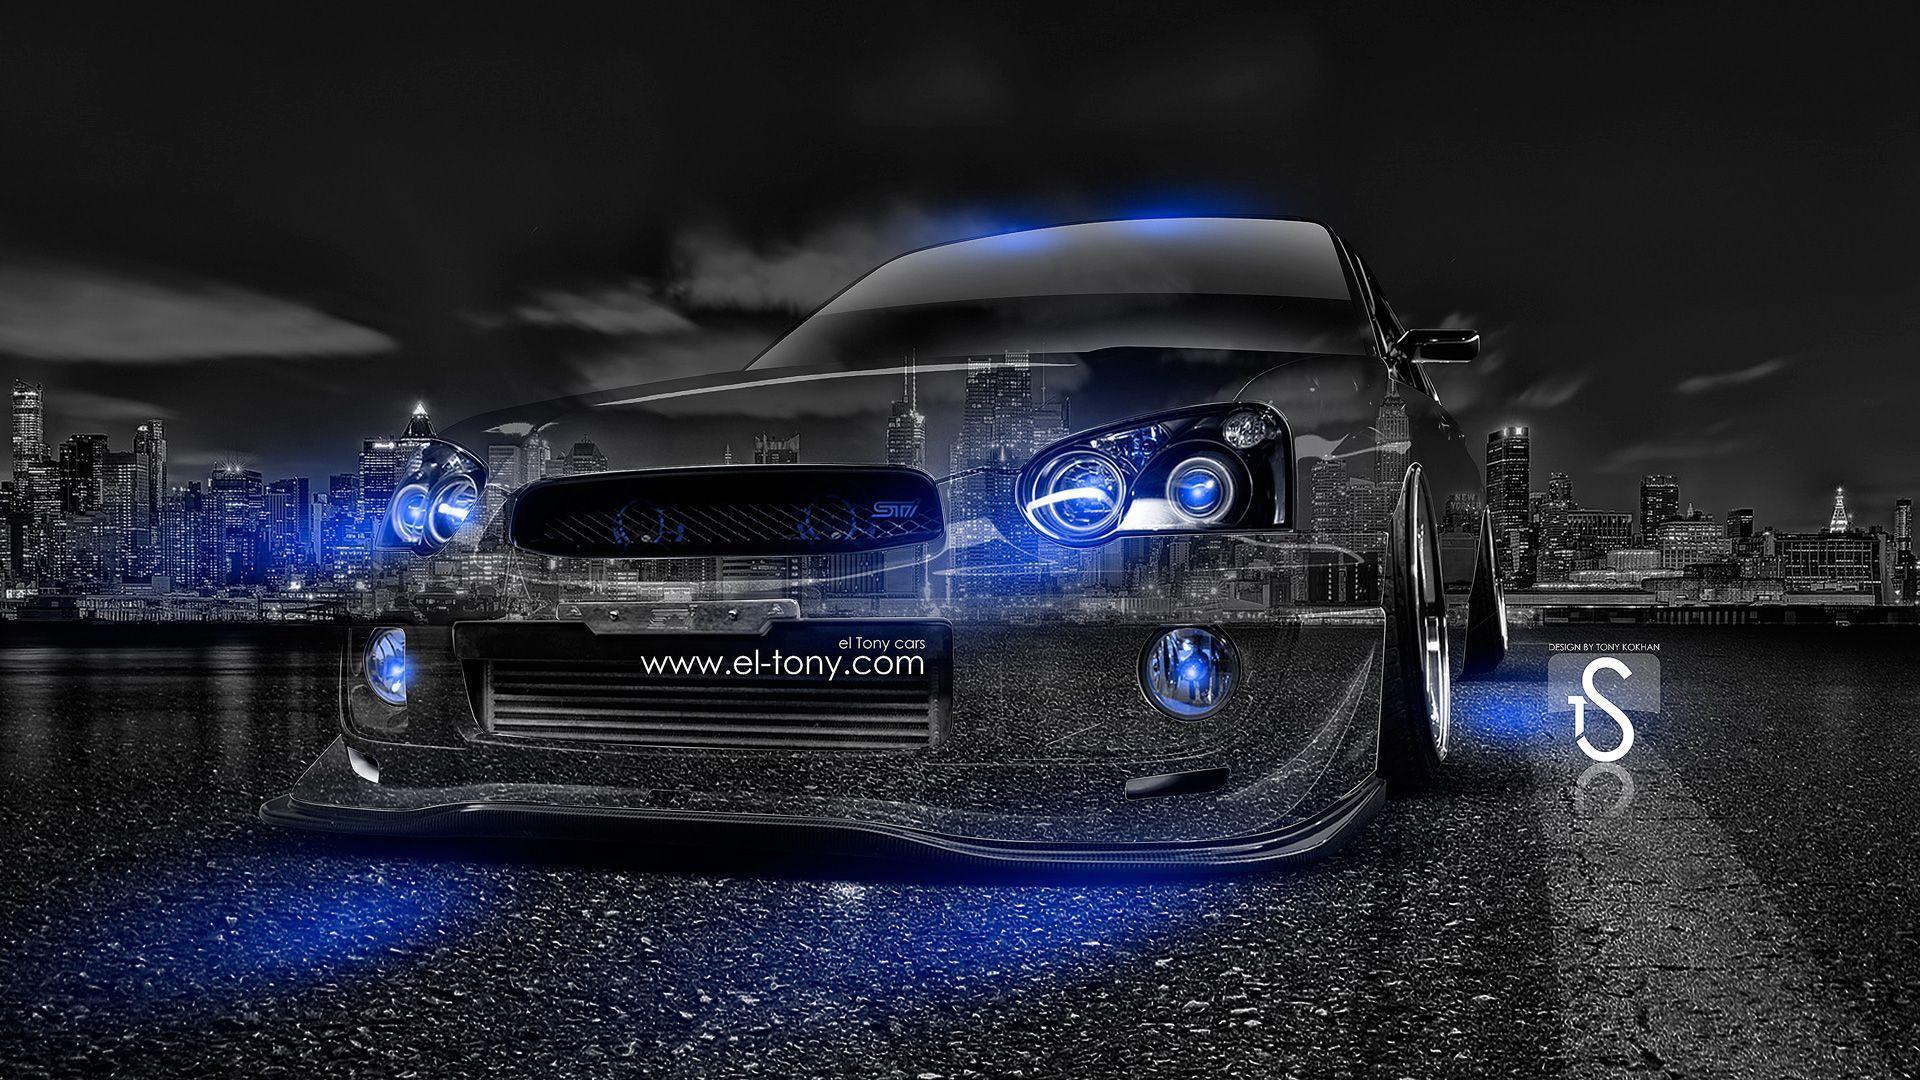 Great Subaru WRX STI JDM Crystal City Car 2014 « El Tony